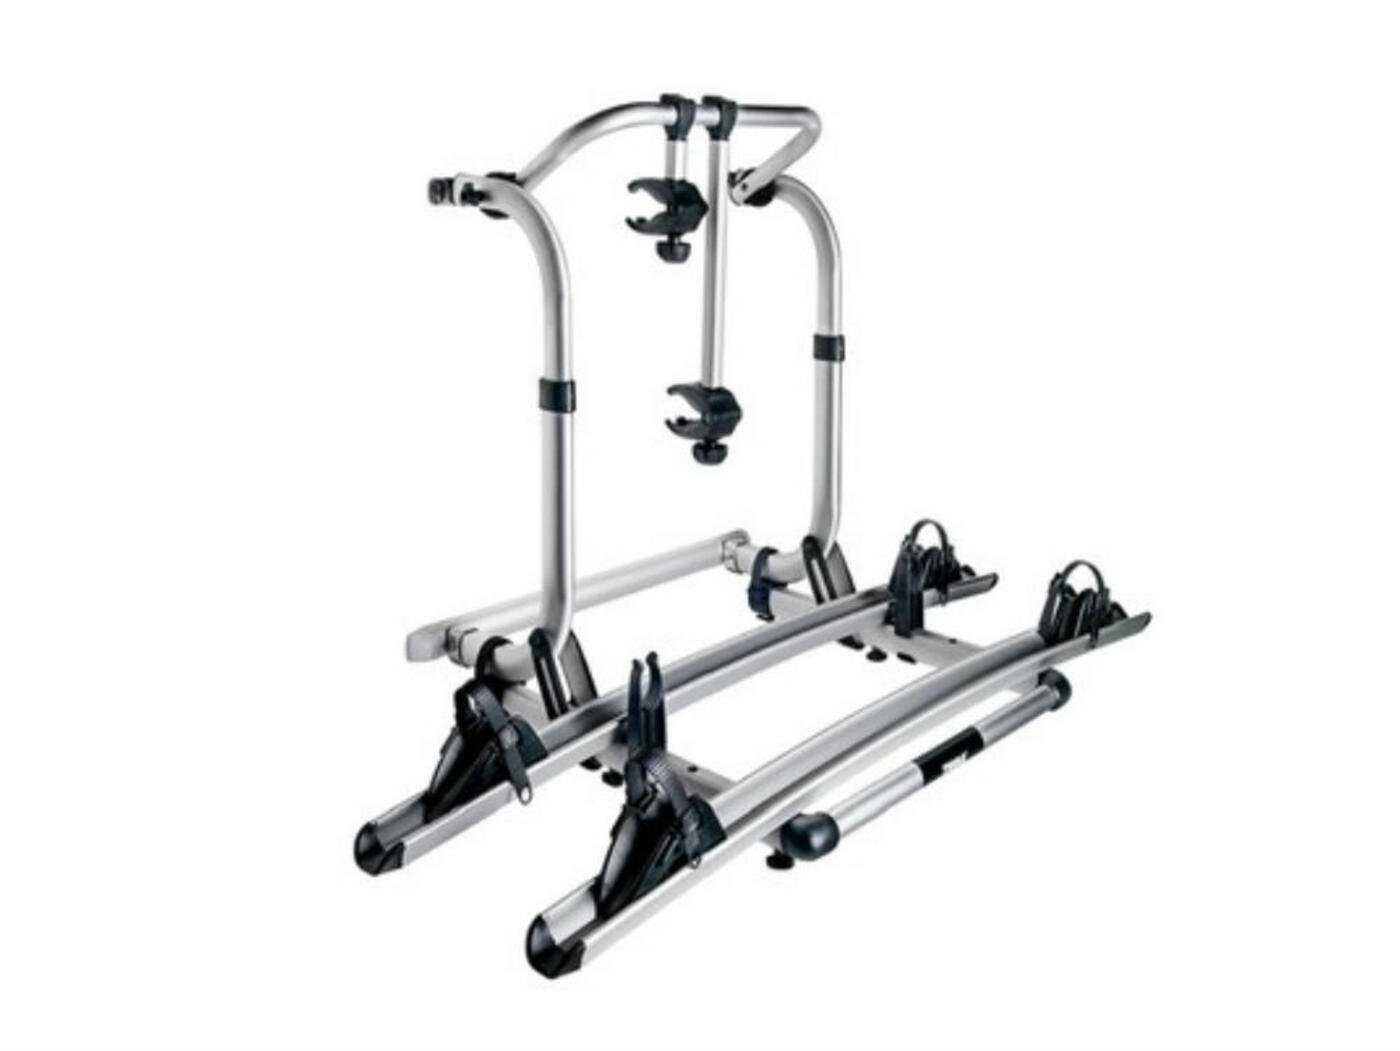 Accessory Shop Thule Elite G2 Bike Rack Short Version